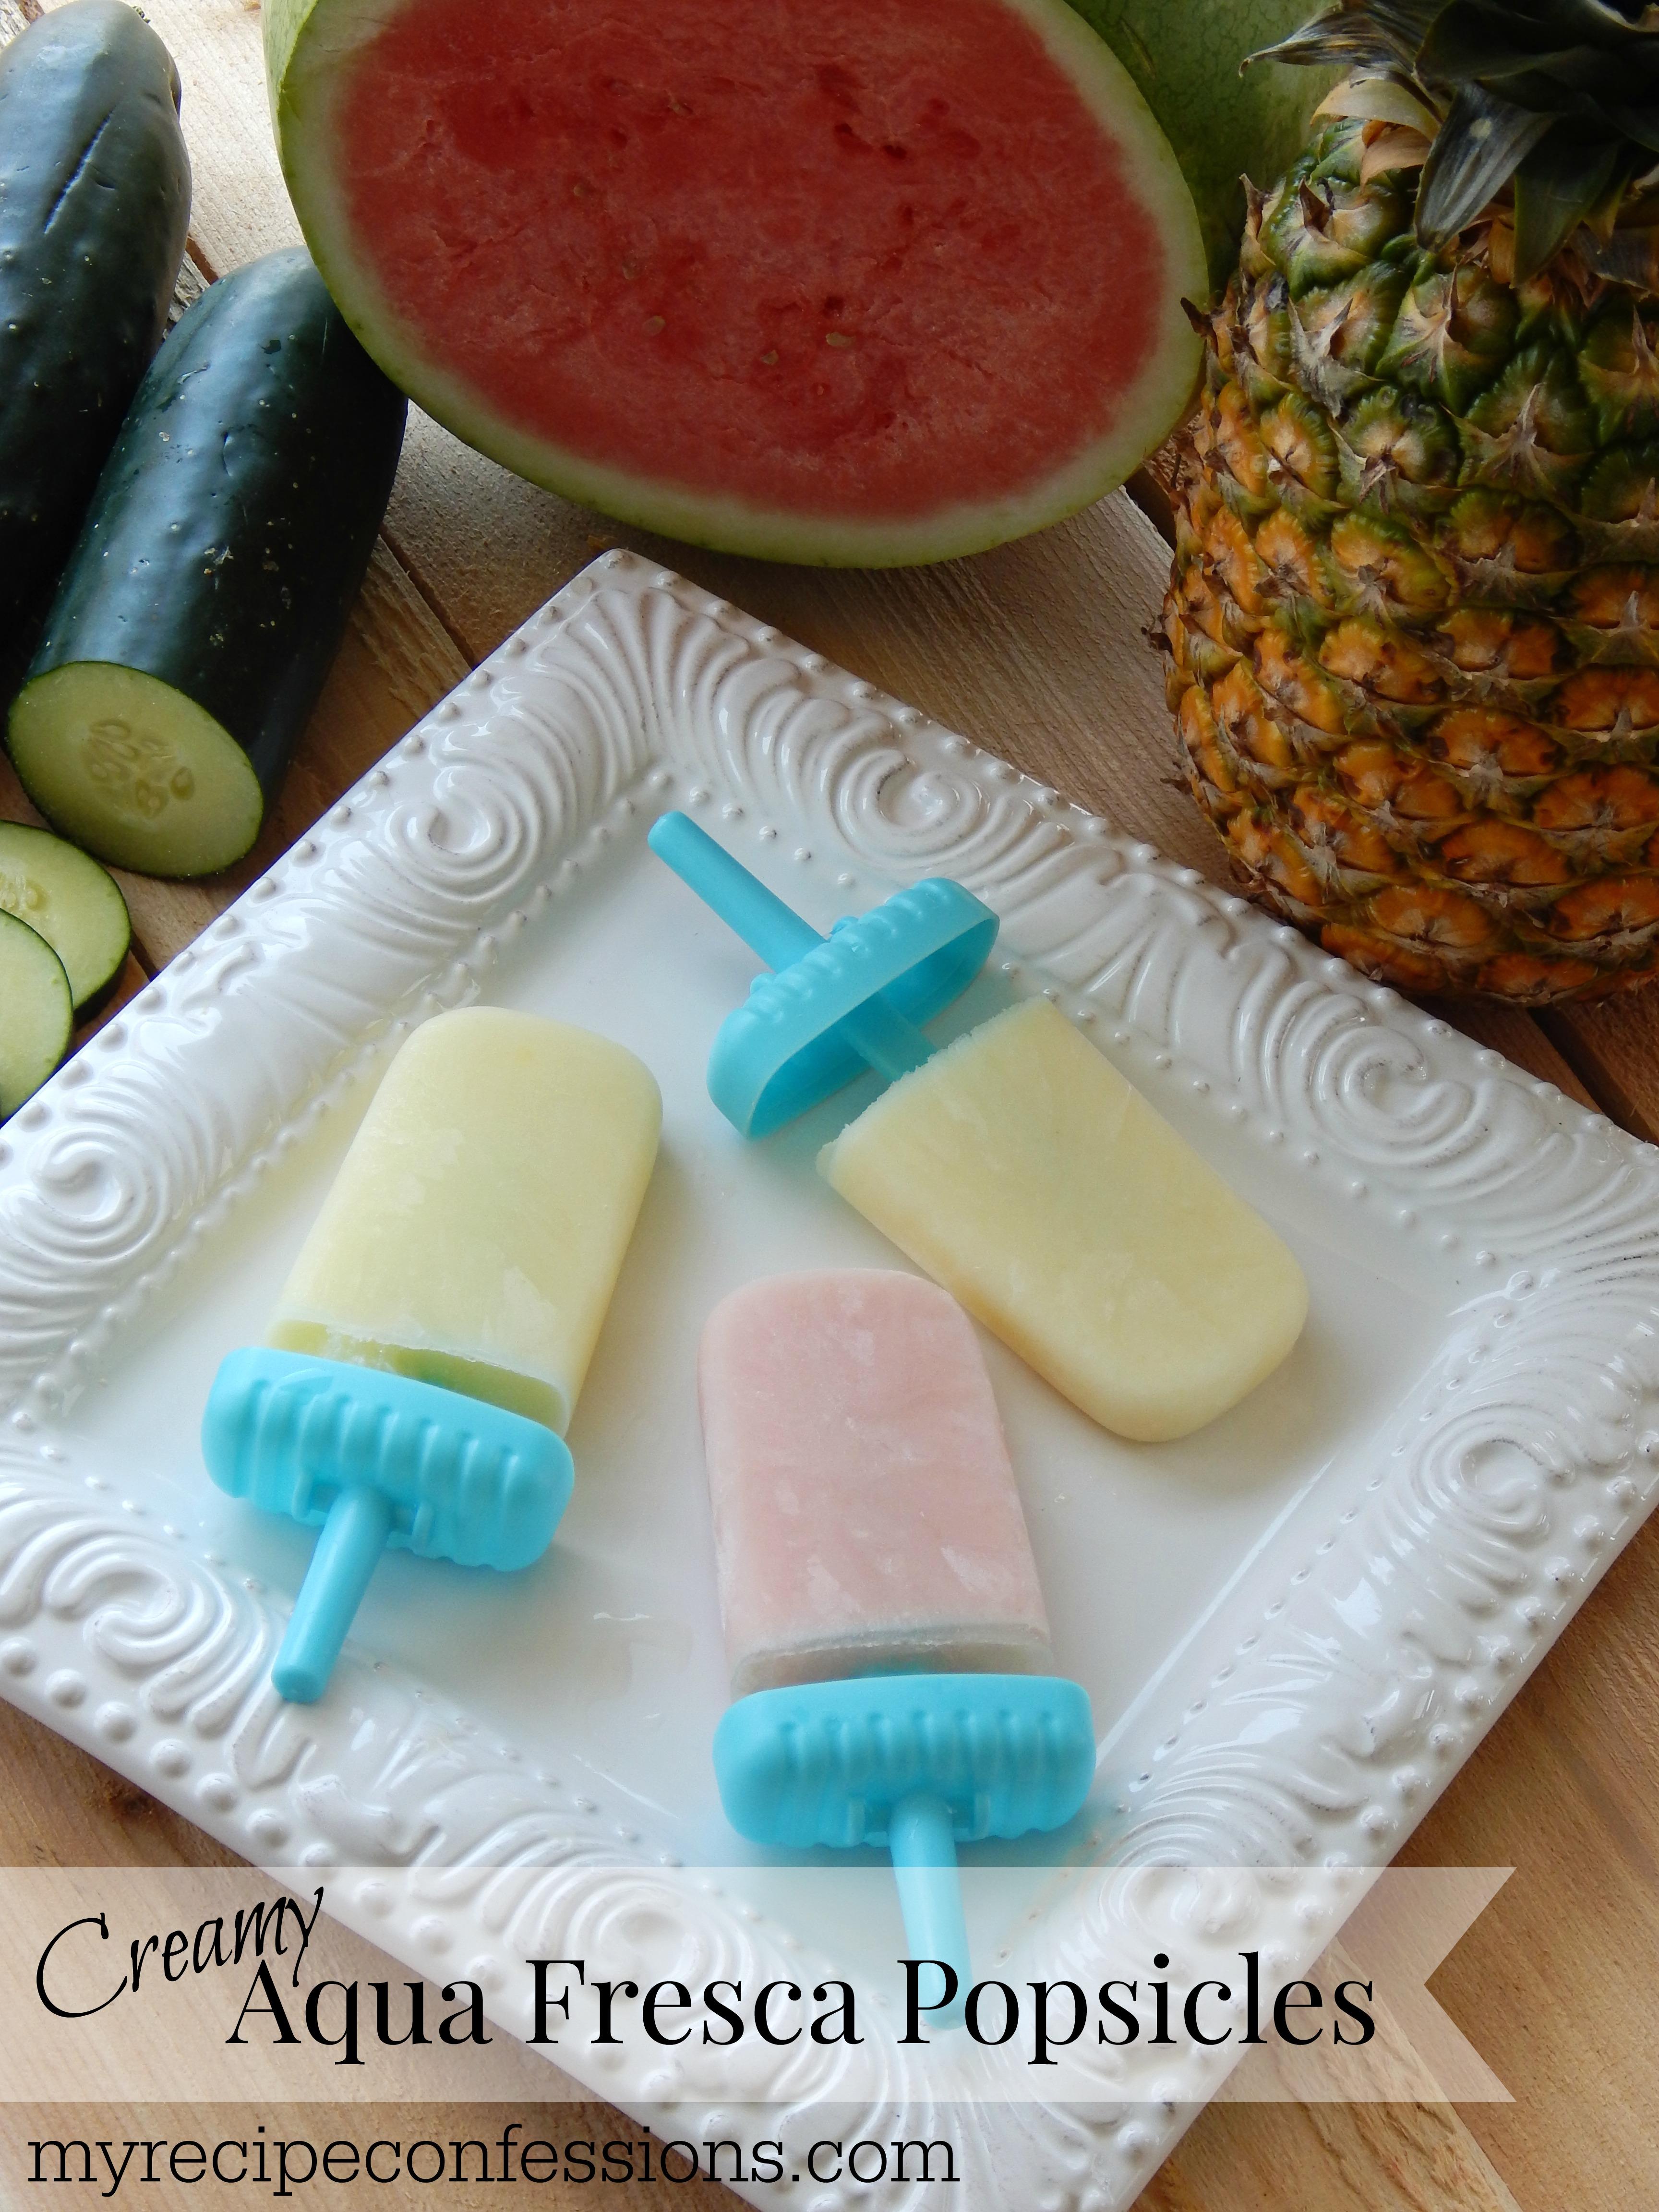 Creamy Aqua Fresca Popsicles